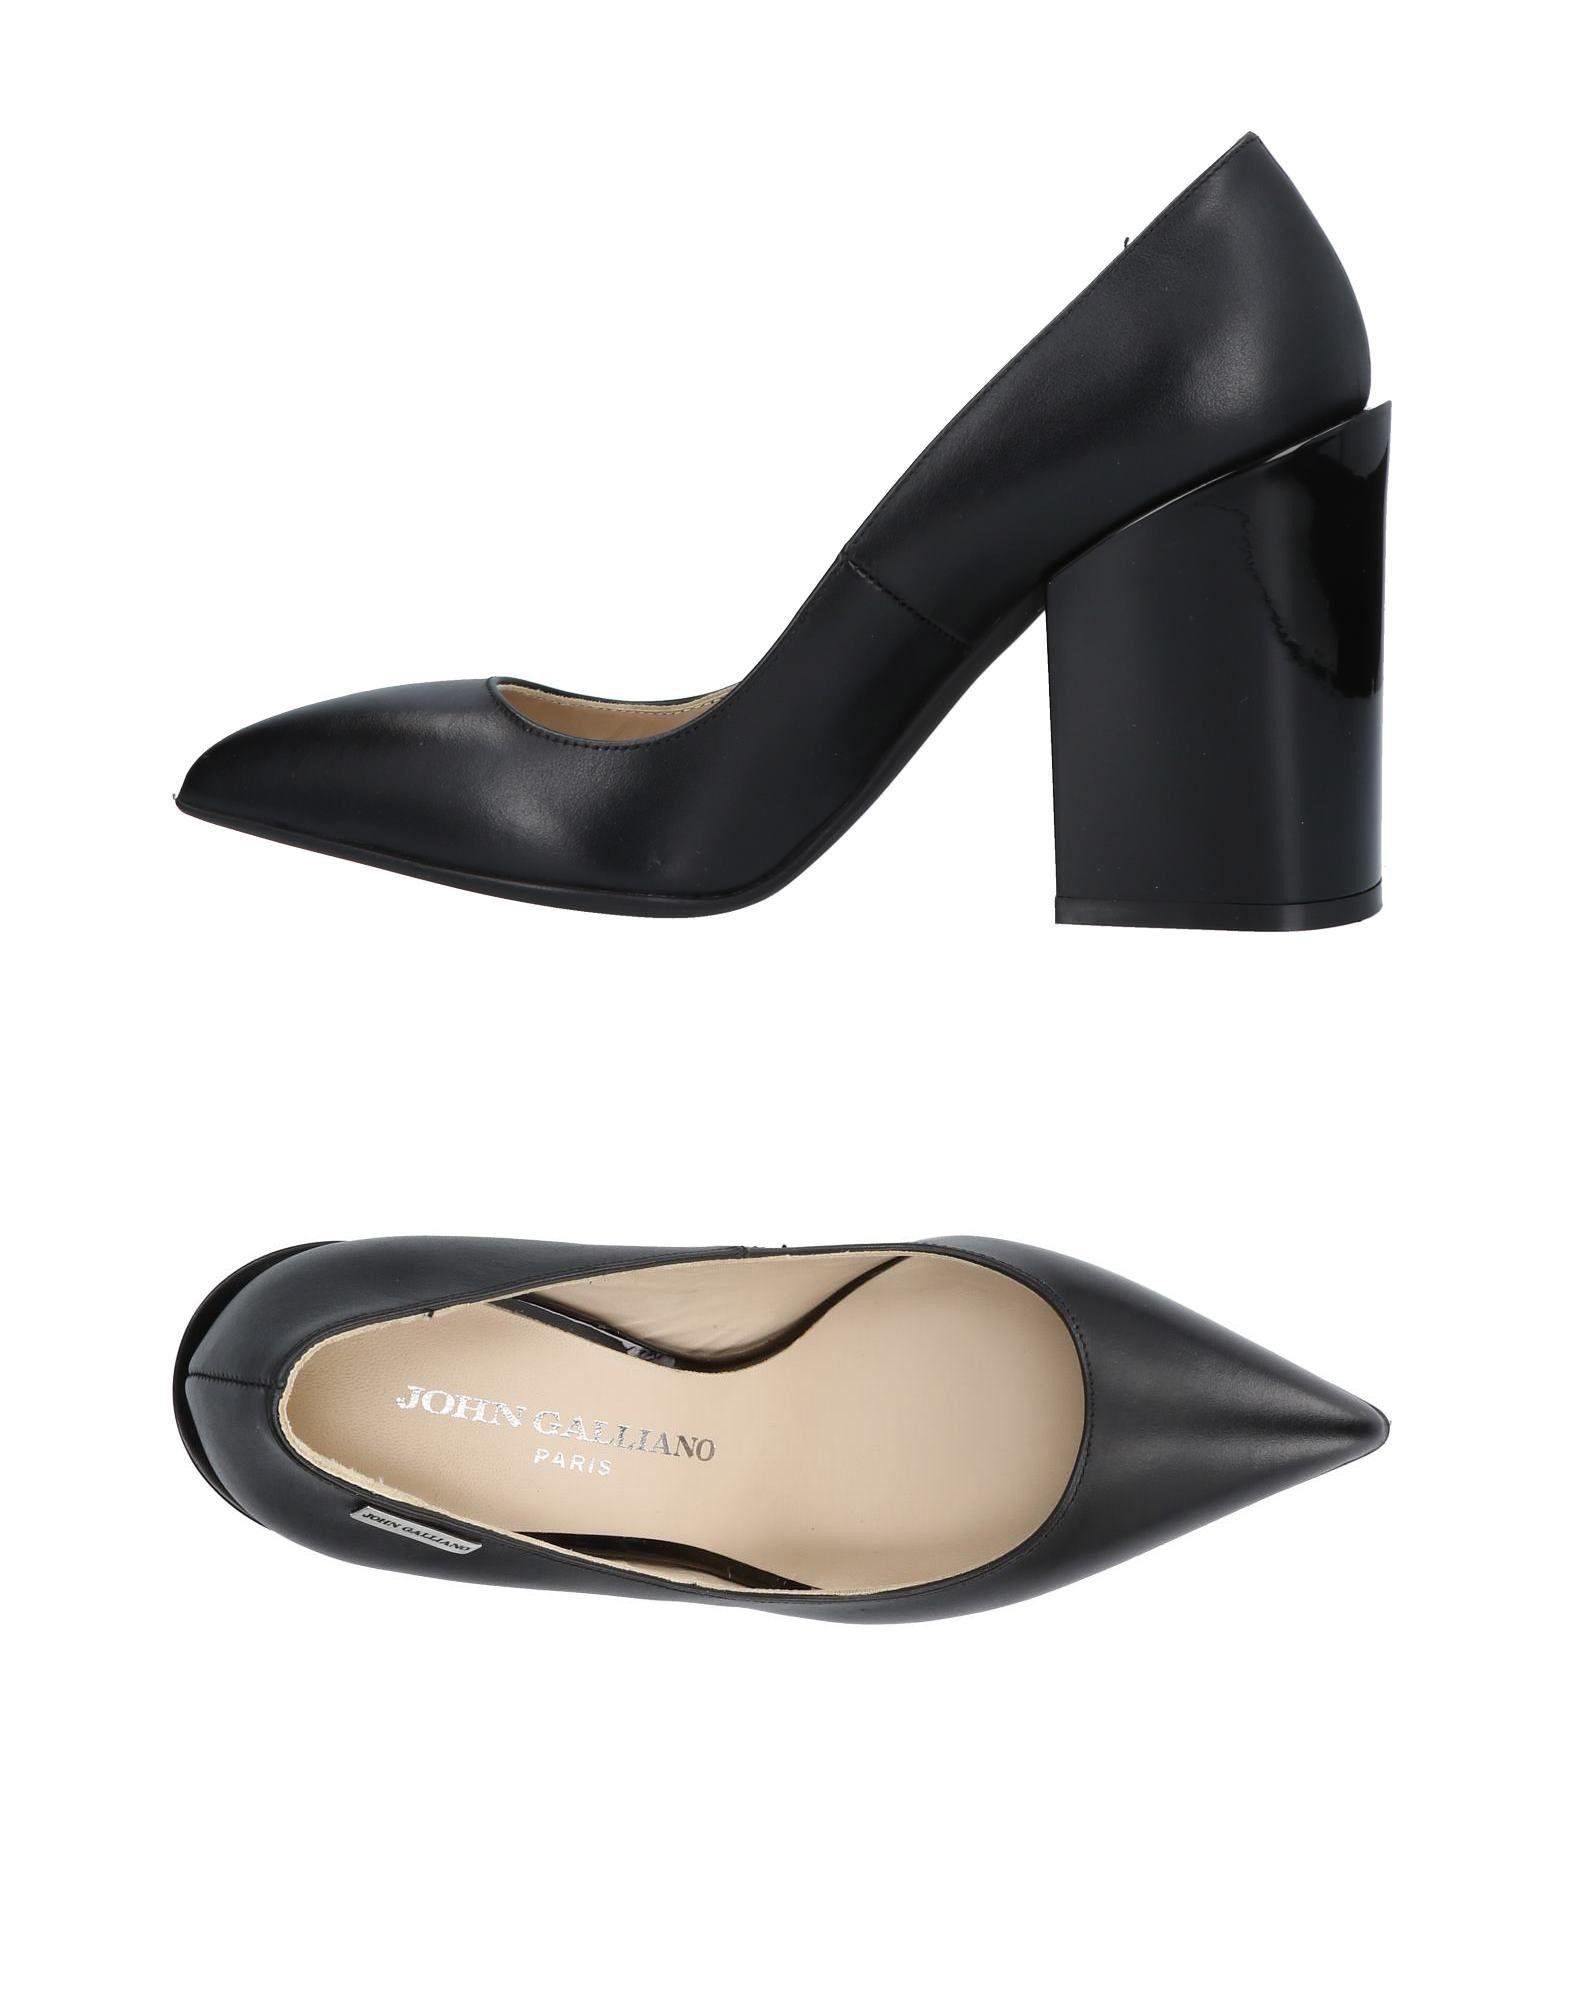 Stilvolle billige Schuhe John Galliano Pumps Damen  11426475QM